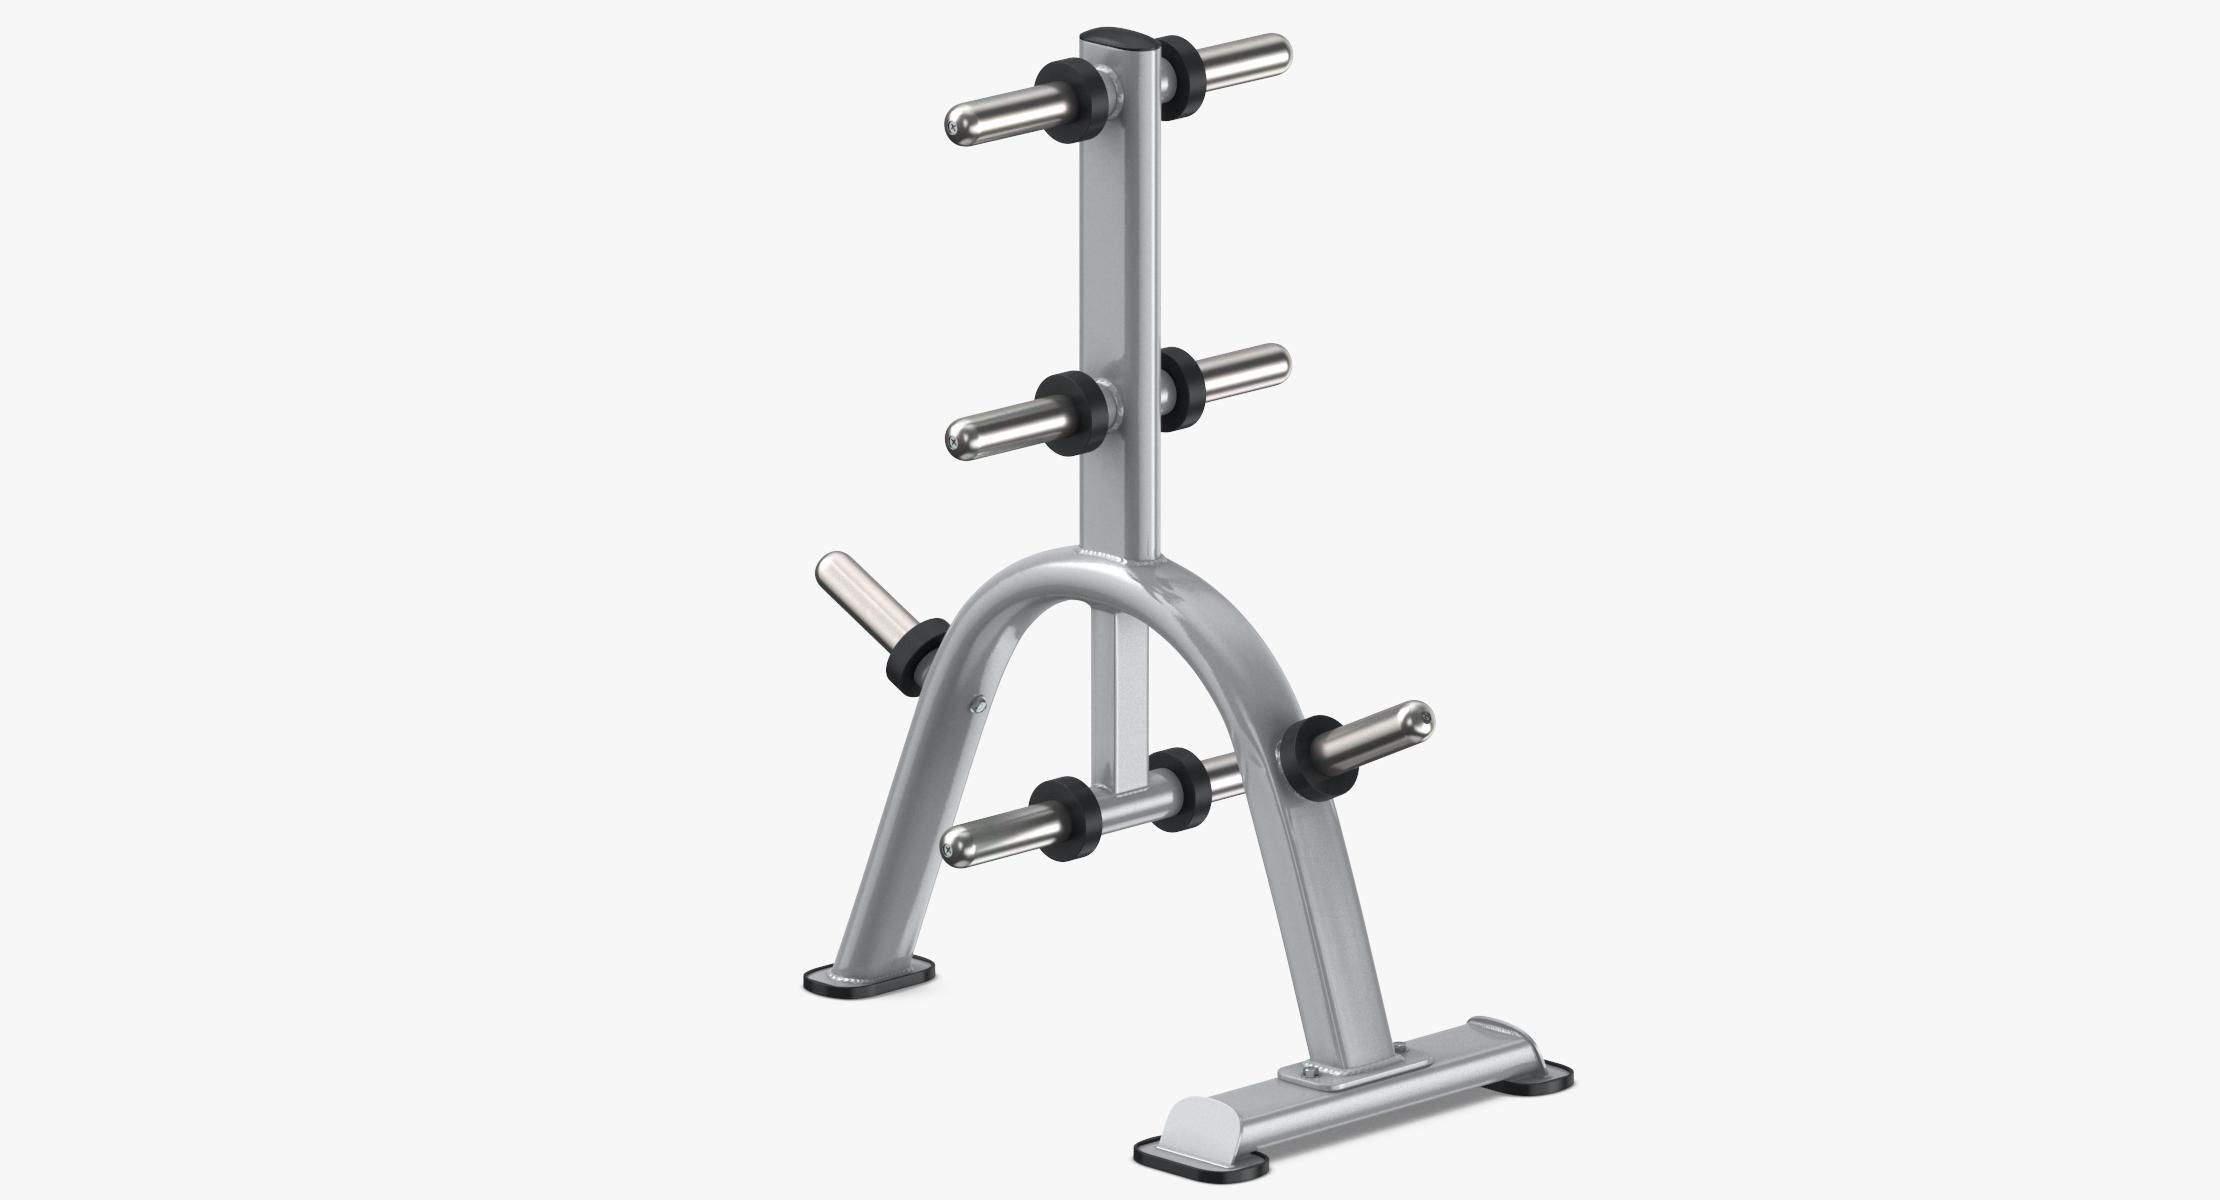 Weight Plates Rack - reel 1